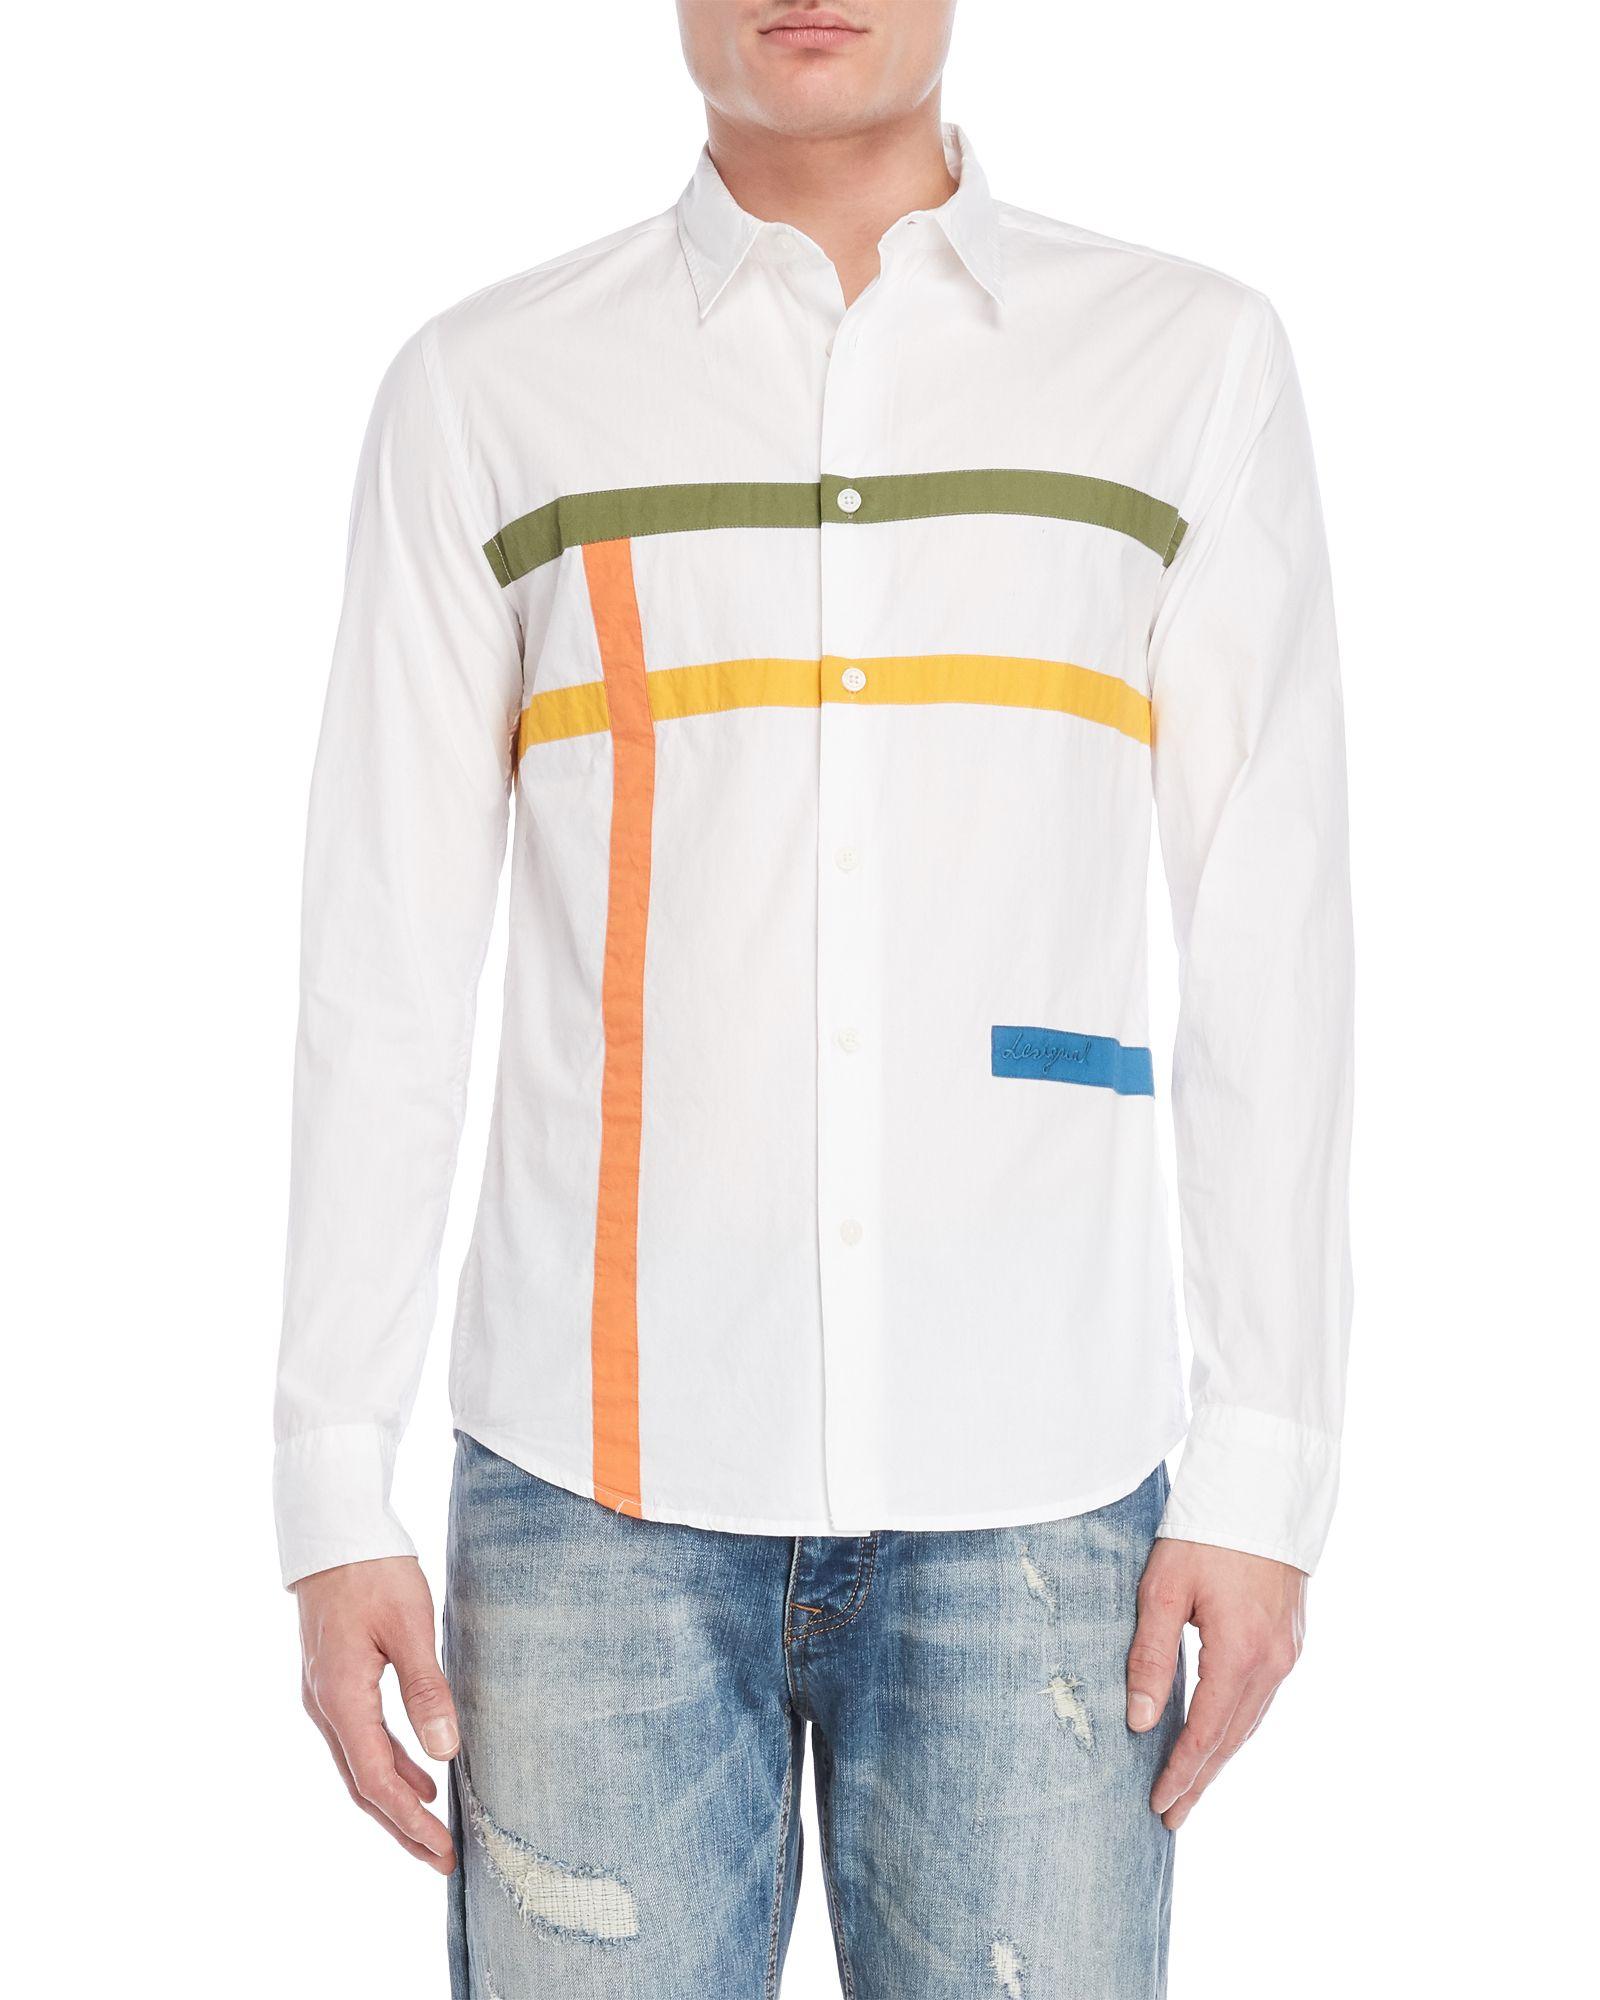 0ffc561c95e Desigual White Stripe Regular Fit Sport Shirt